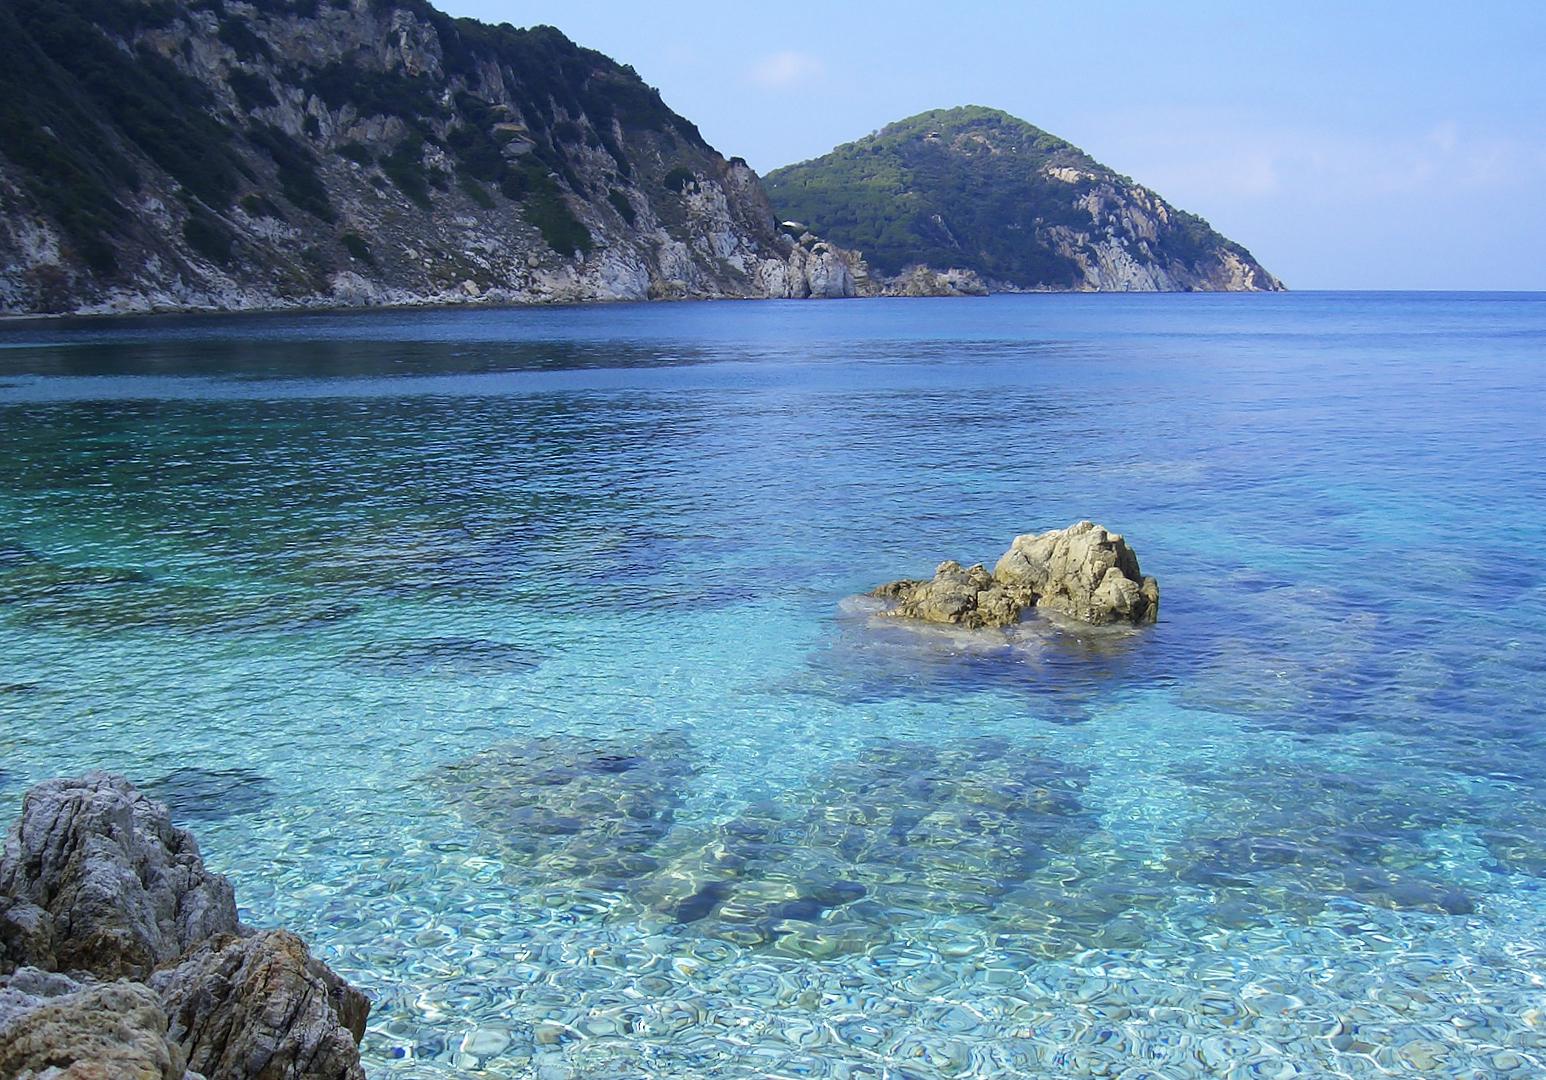 Spiagge toscane, premiata l'eccellenza